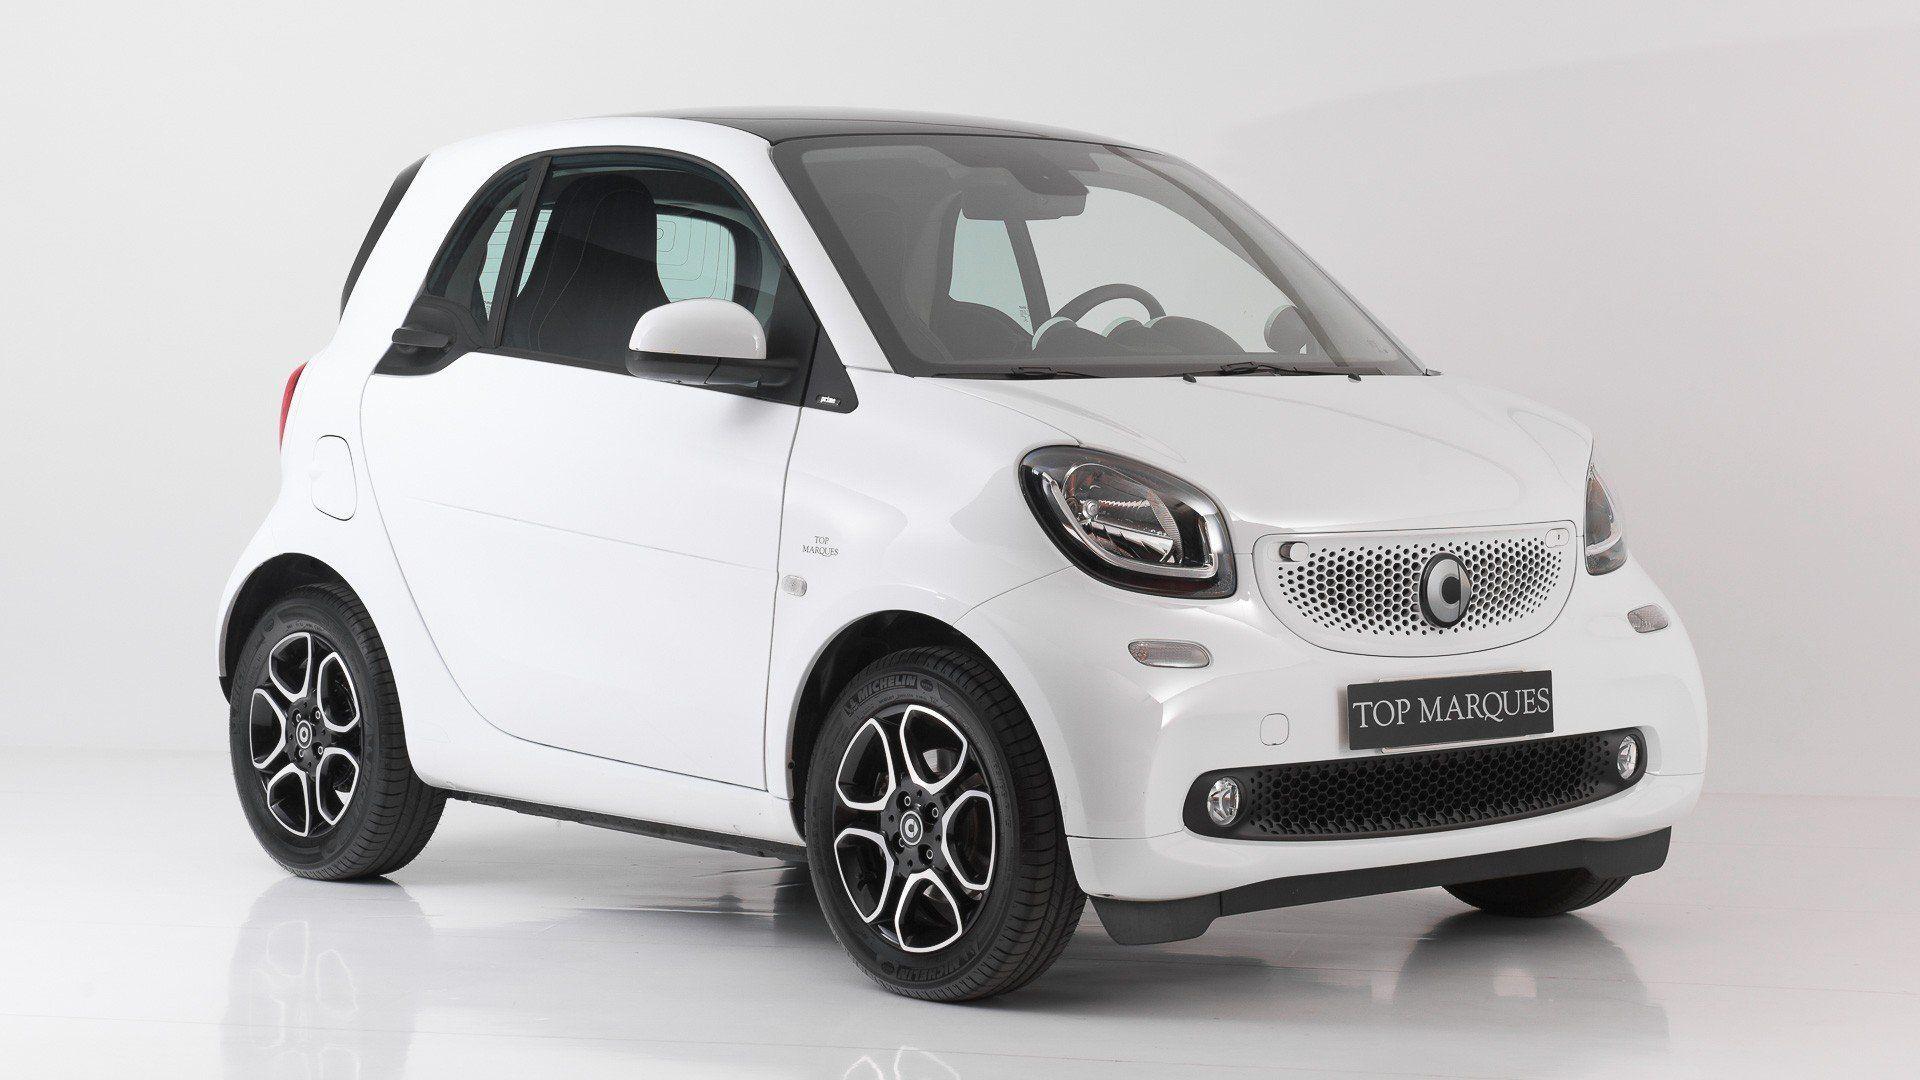 2015 Smart Fortwo 90 0 9 Turbo Prime